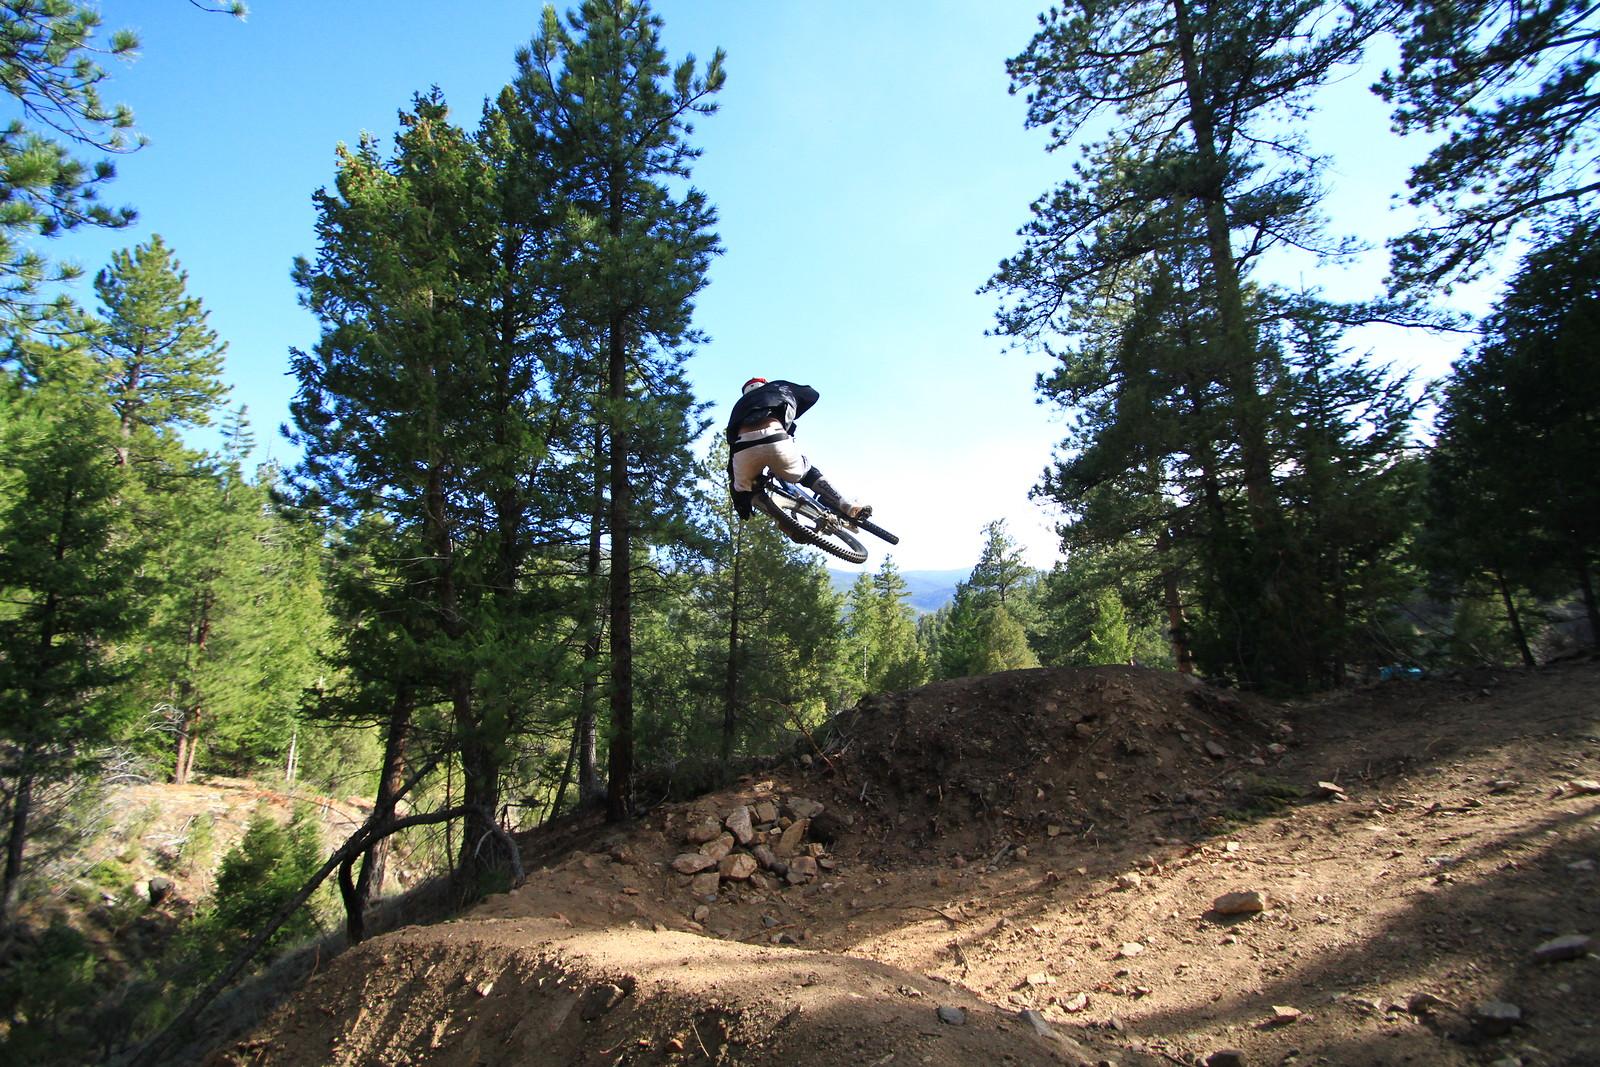 The Purple Dragon - Chuck_Quinton - Mountain Biking Pictures - Vital MTB